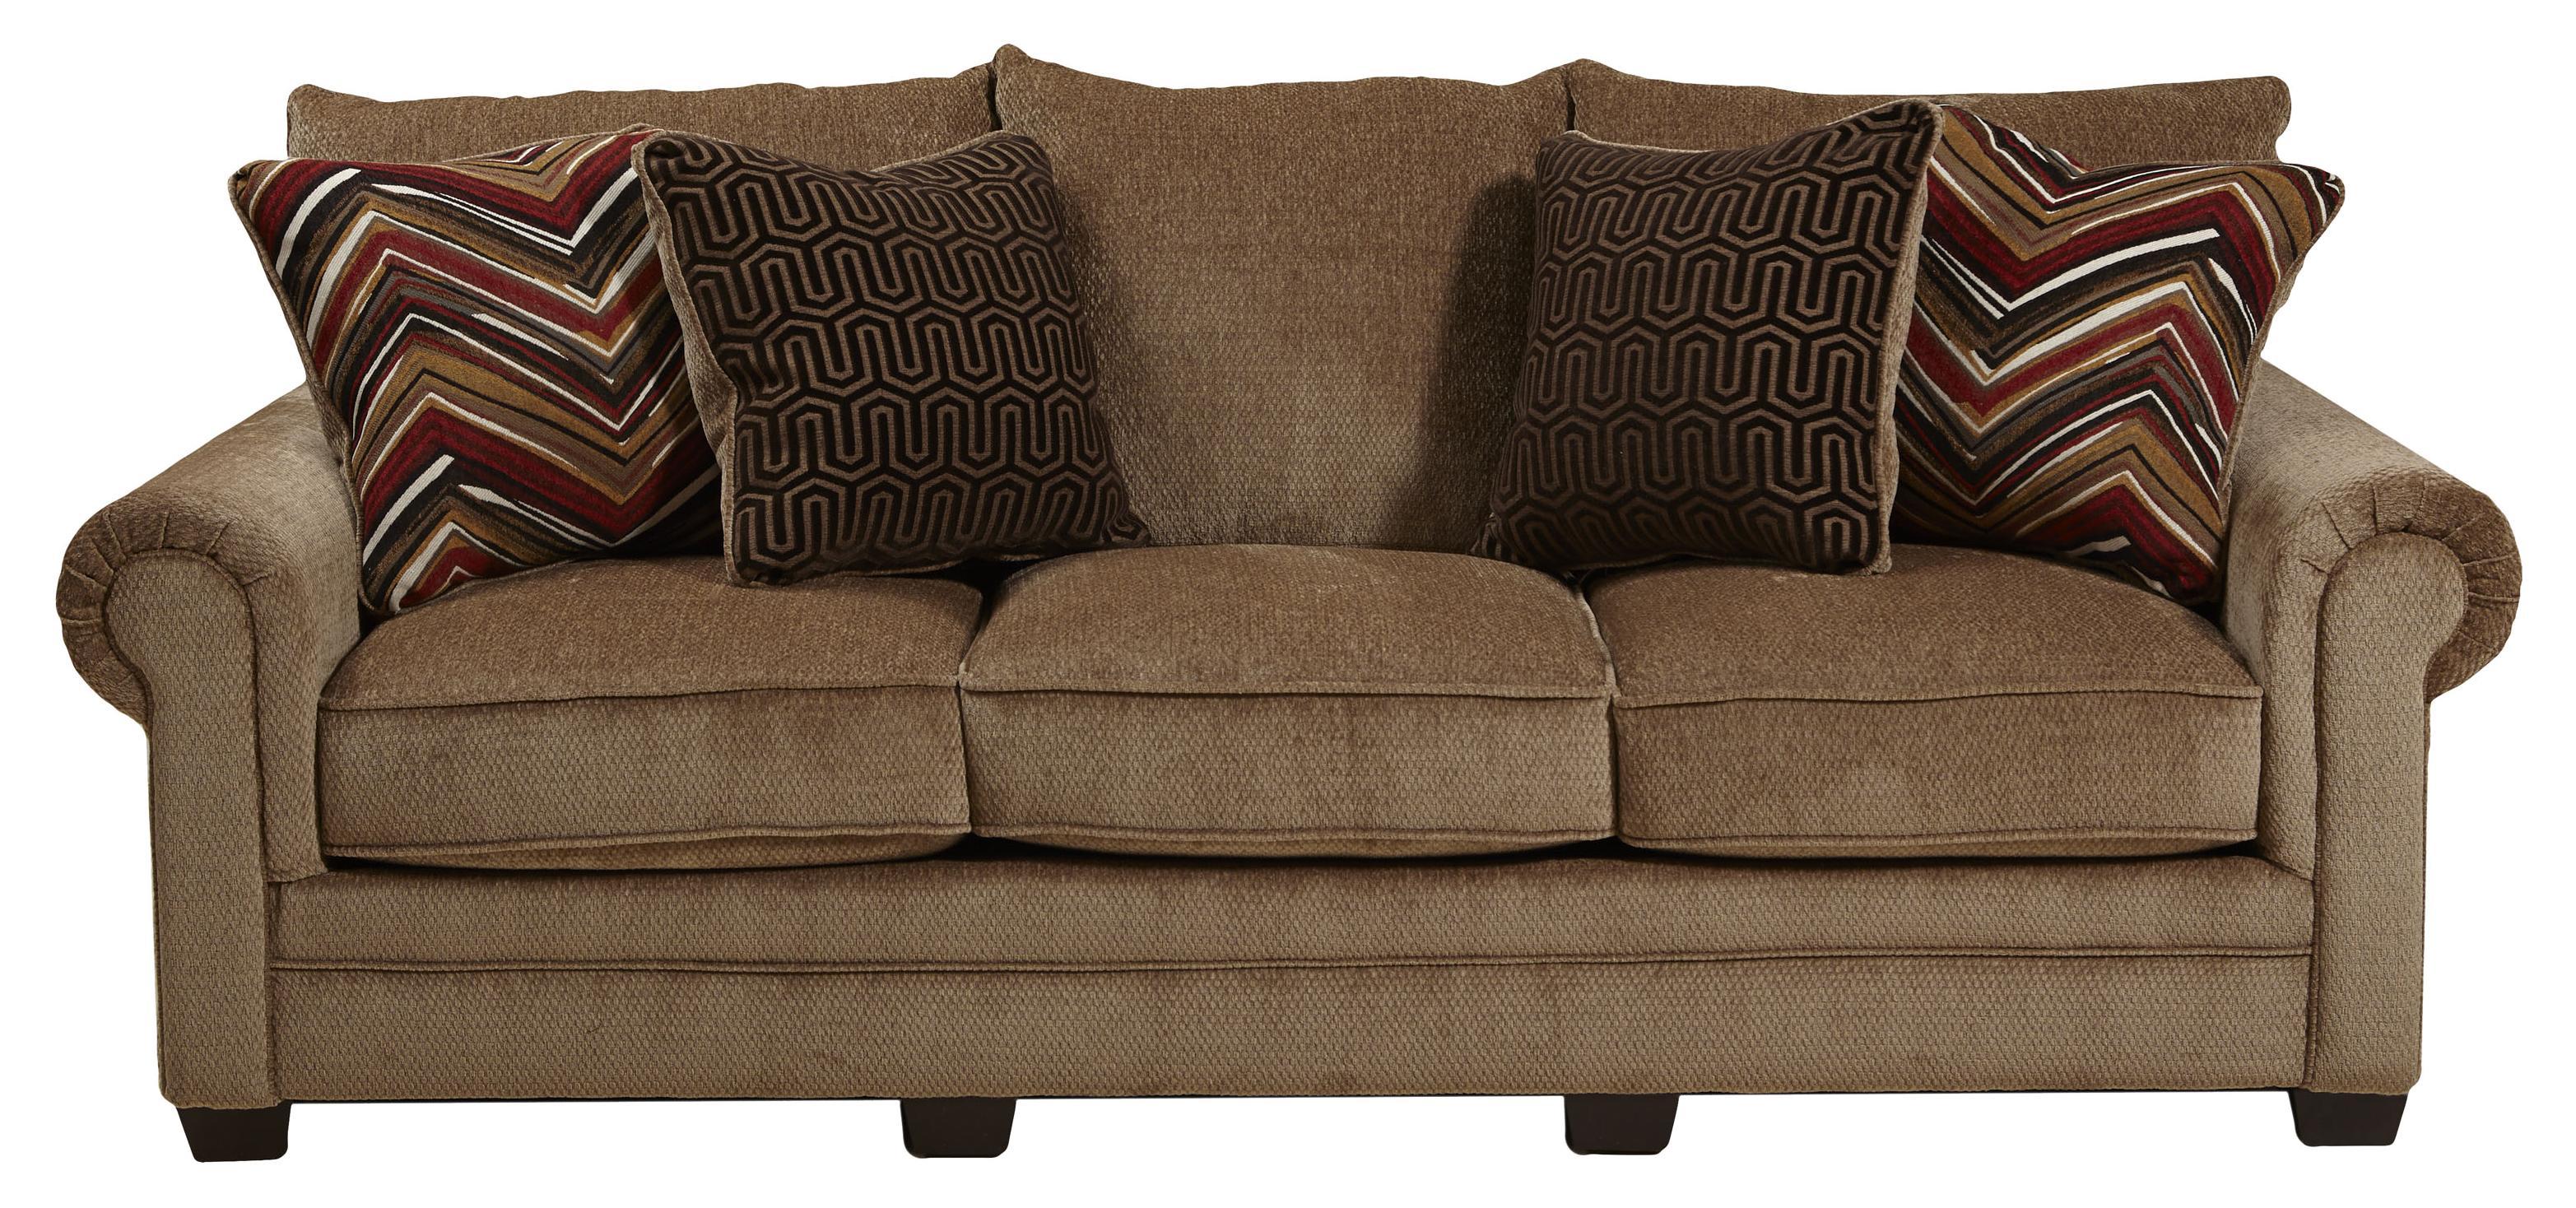 Jackson Furniture Anniston Rolled Arm Sofa EFO Furniture